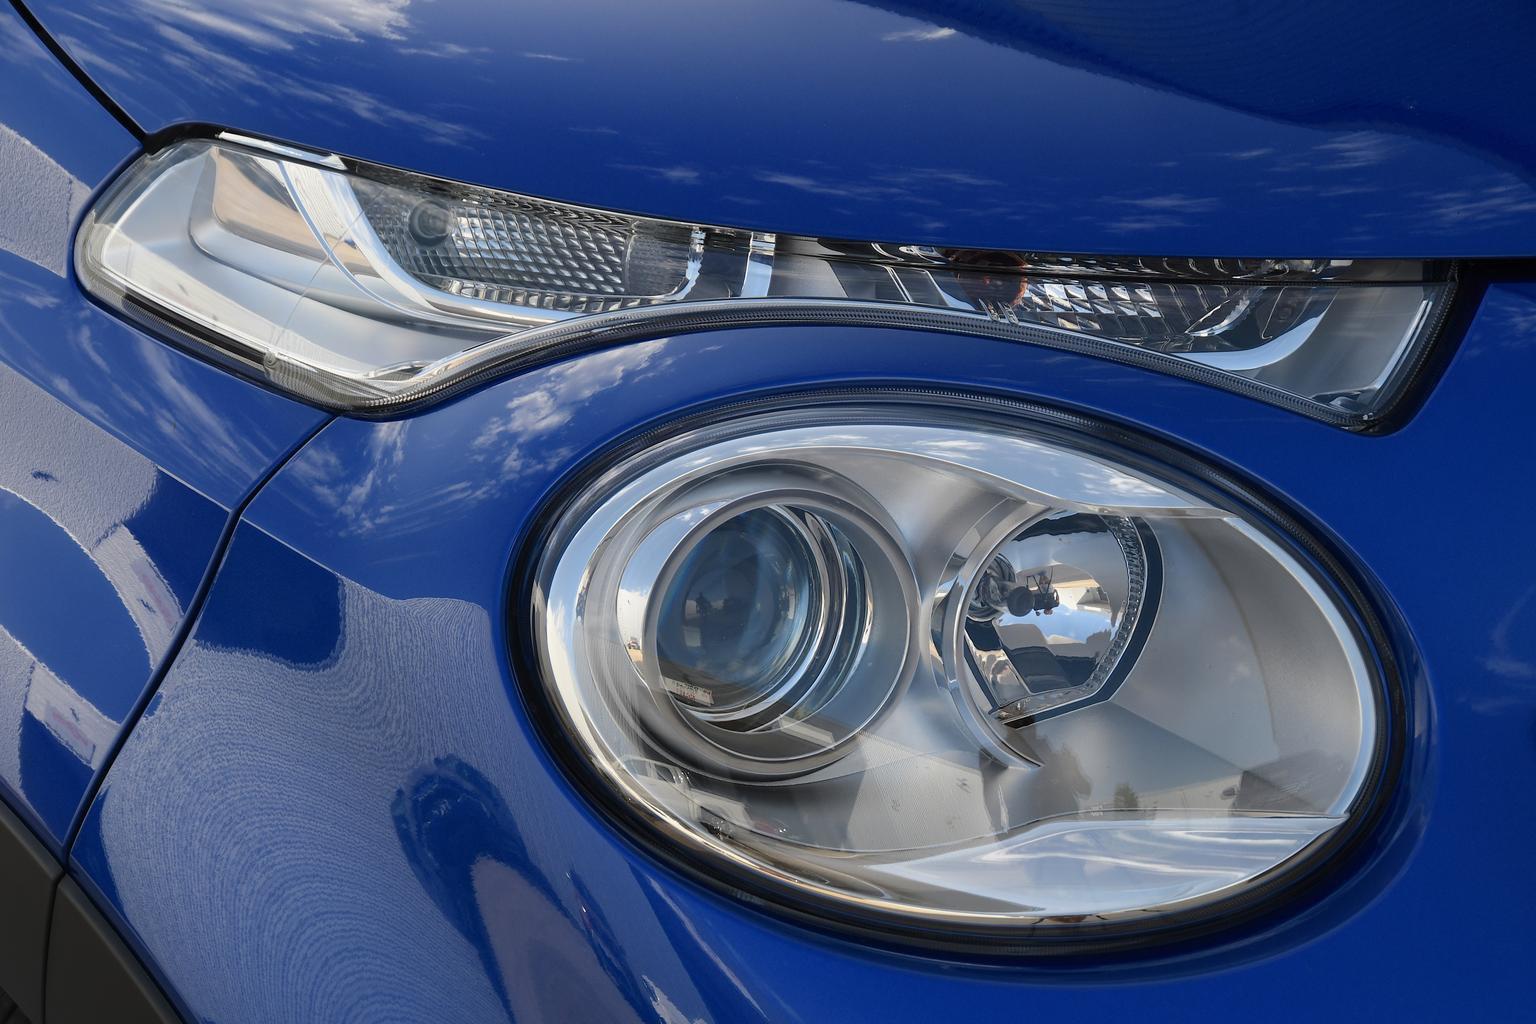 Citroën C1 Urban Ride headlight